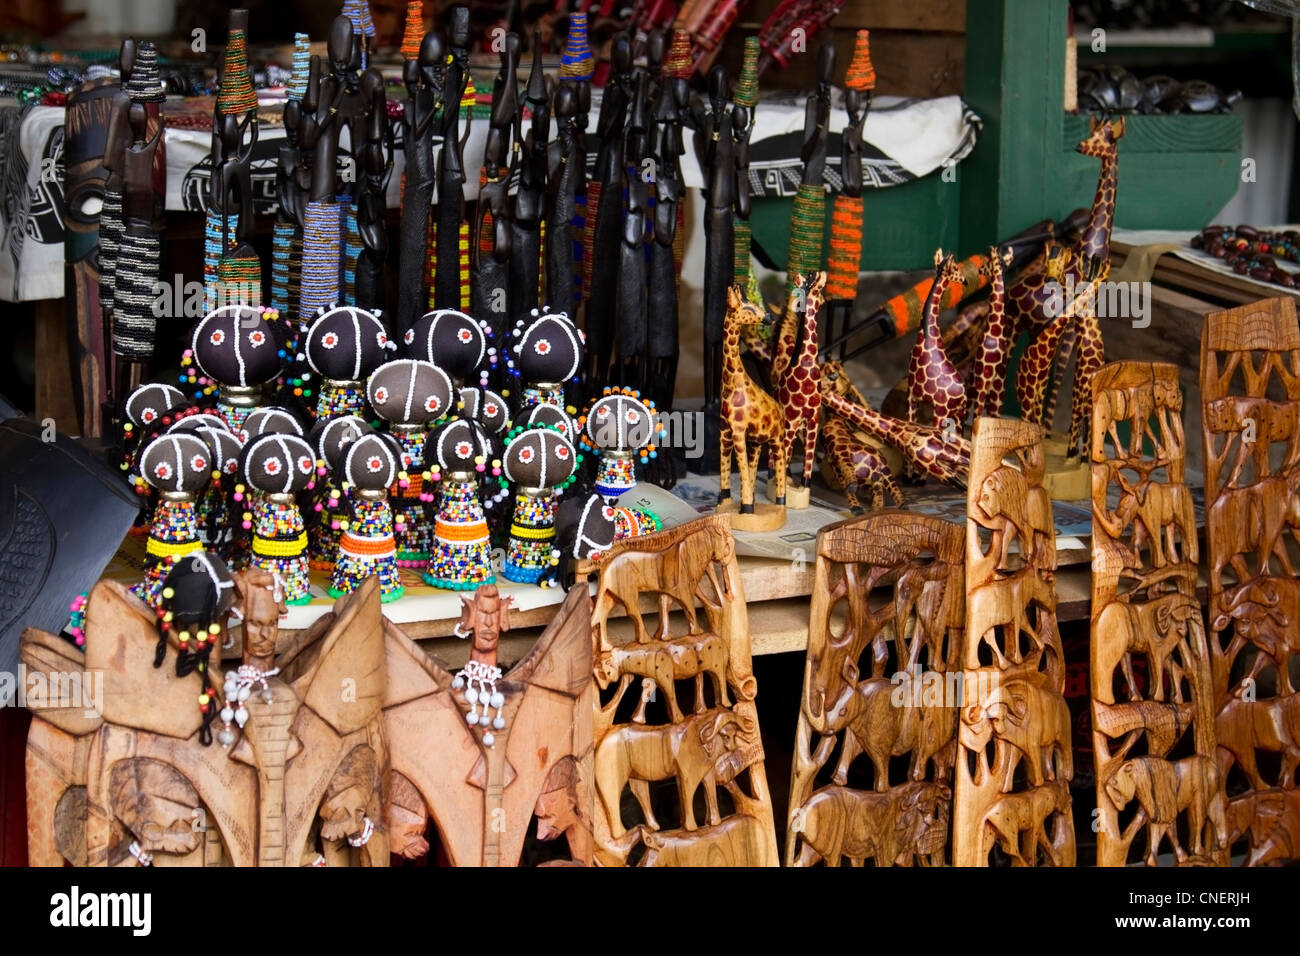 Curio stall in Pilgrim's Rest, Mpumalanga - Stock Image